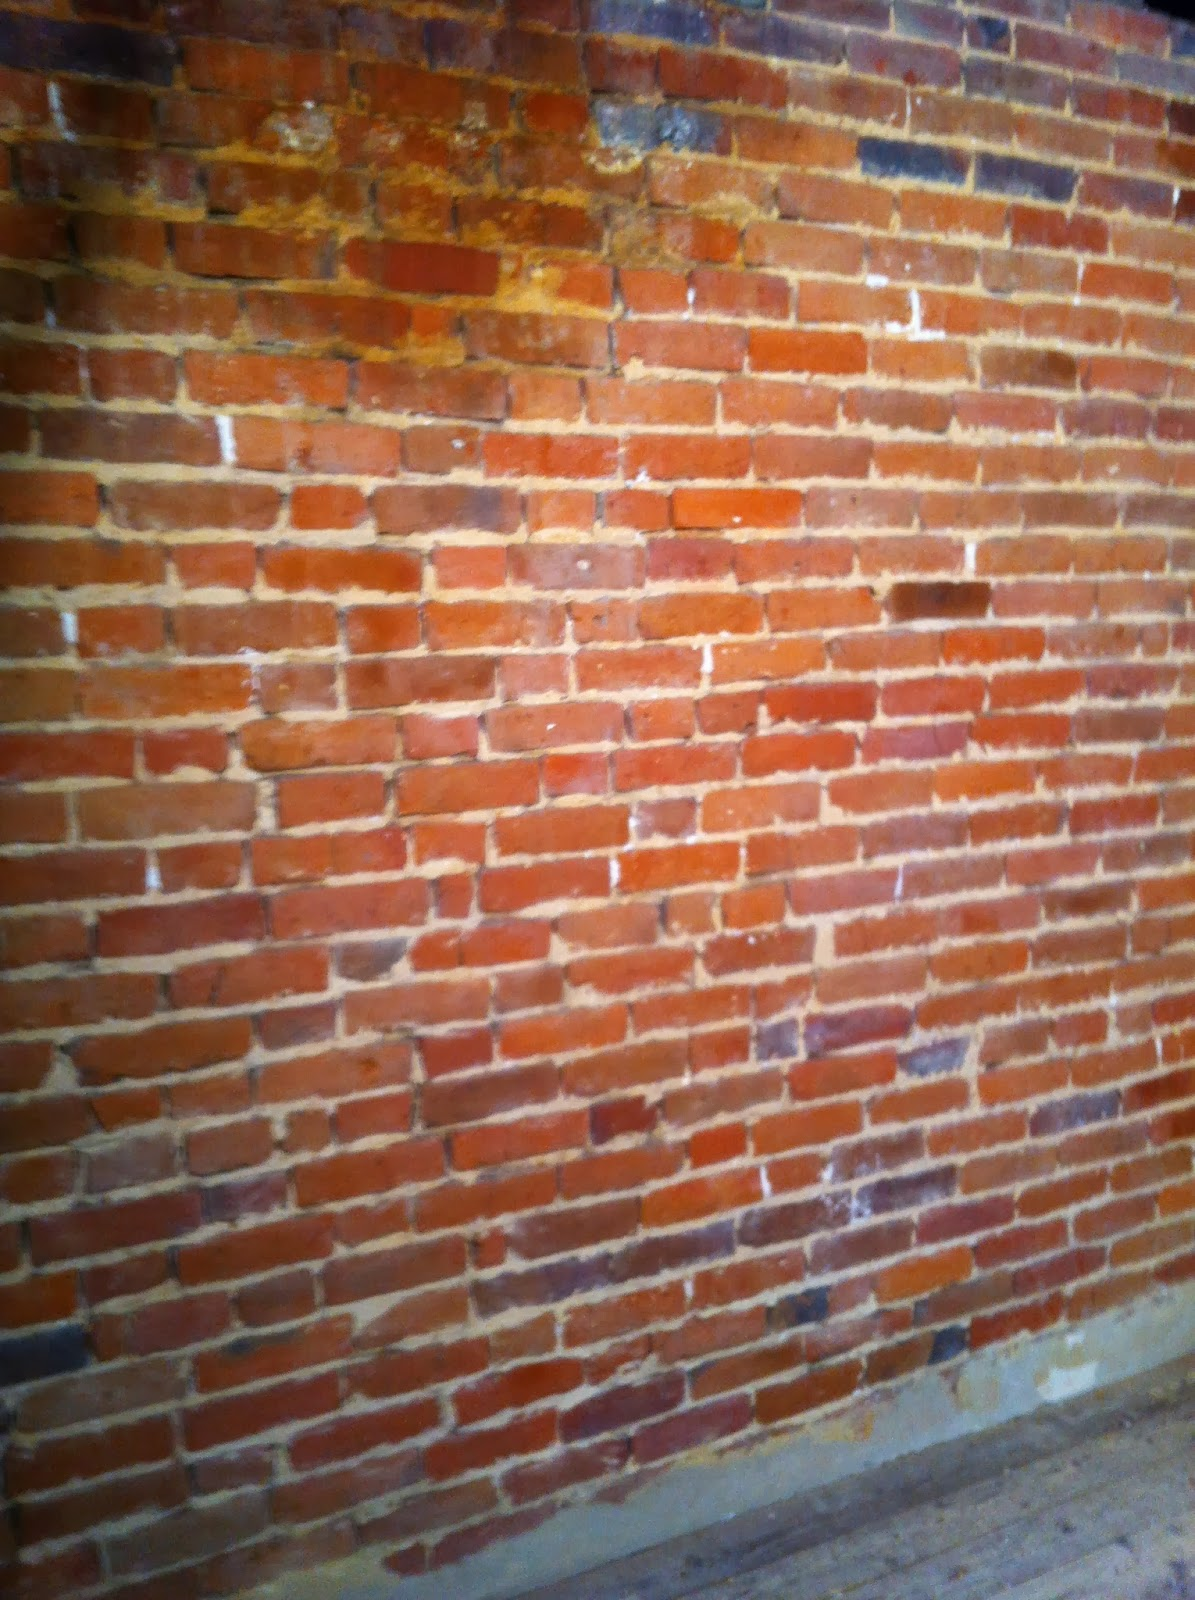 Verveine cognac r nover un mur de briques - Isoler un mur en brique ...